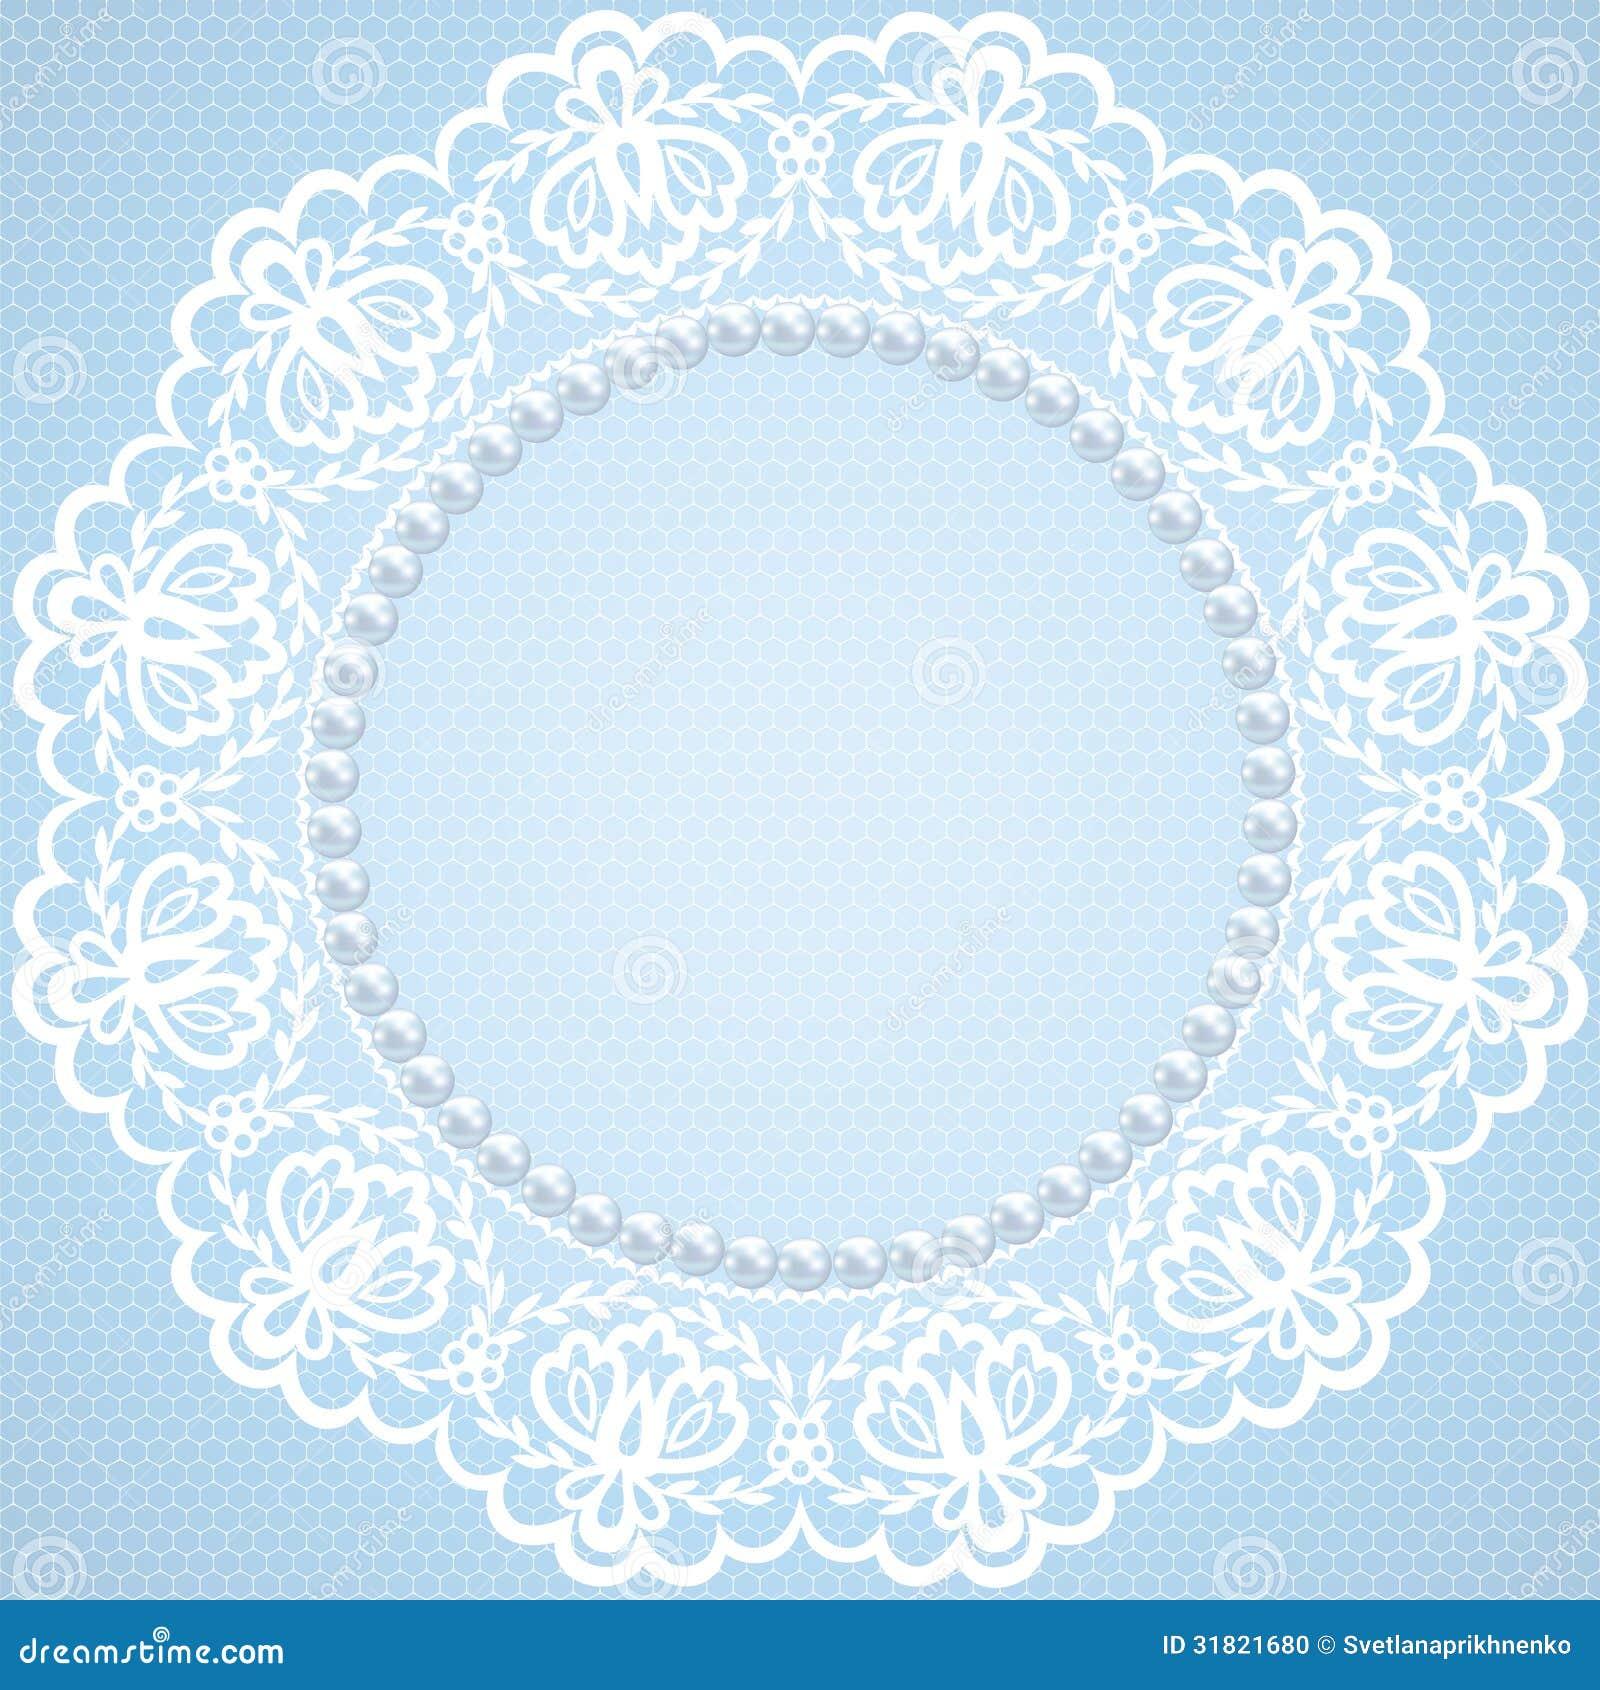 Islamic Wedding Invitation Templates for beautiful invitation example